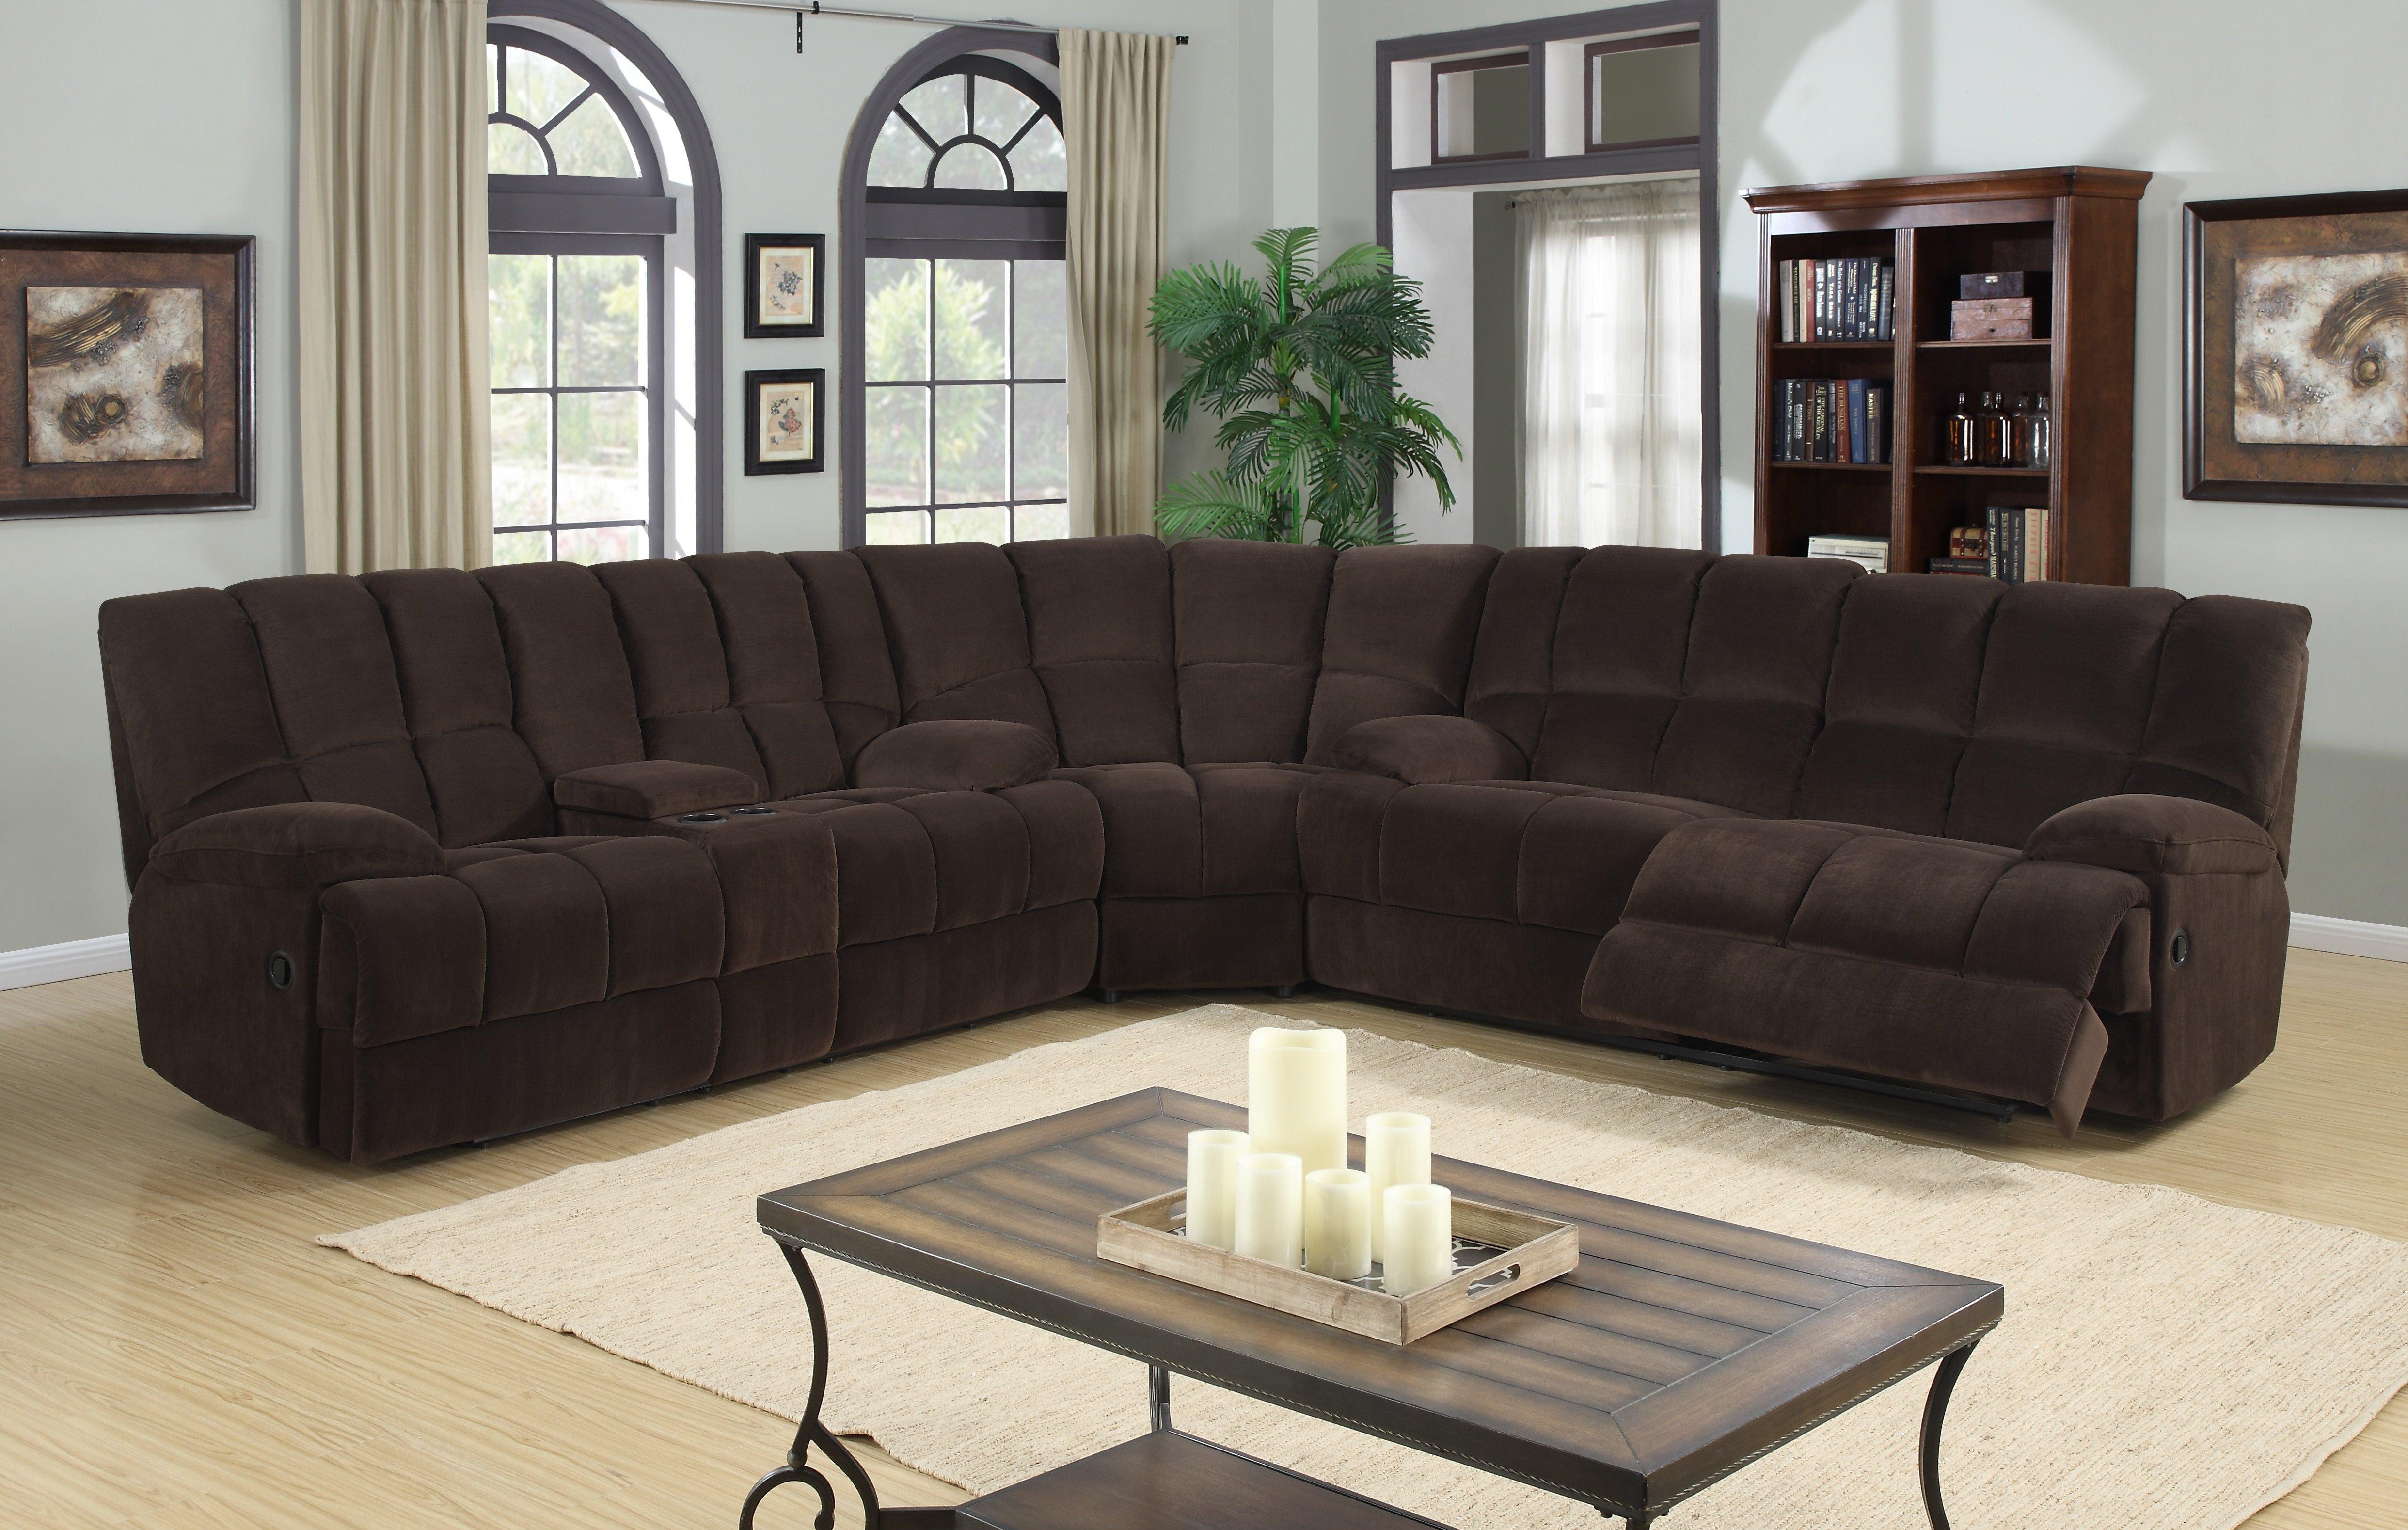 Timeless Furnishings Living Room Gallery